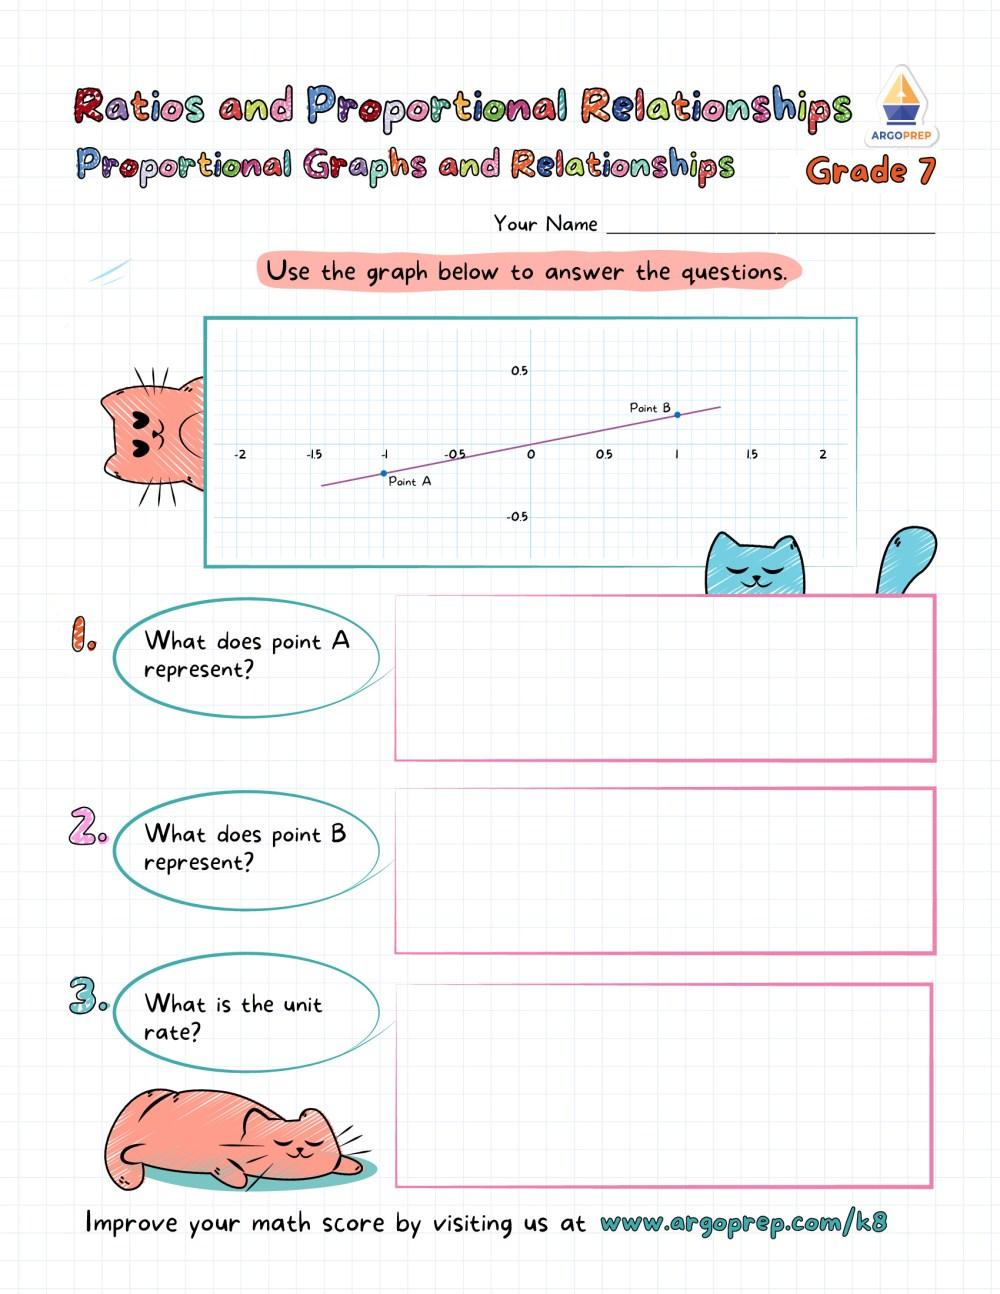 medium resolution of Purring into Proportional Graphs - ArgoPrep